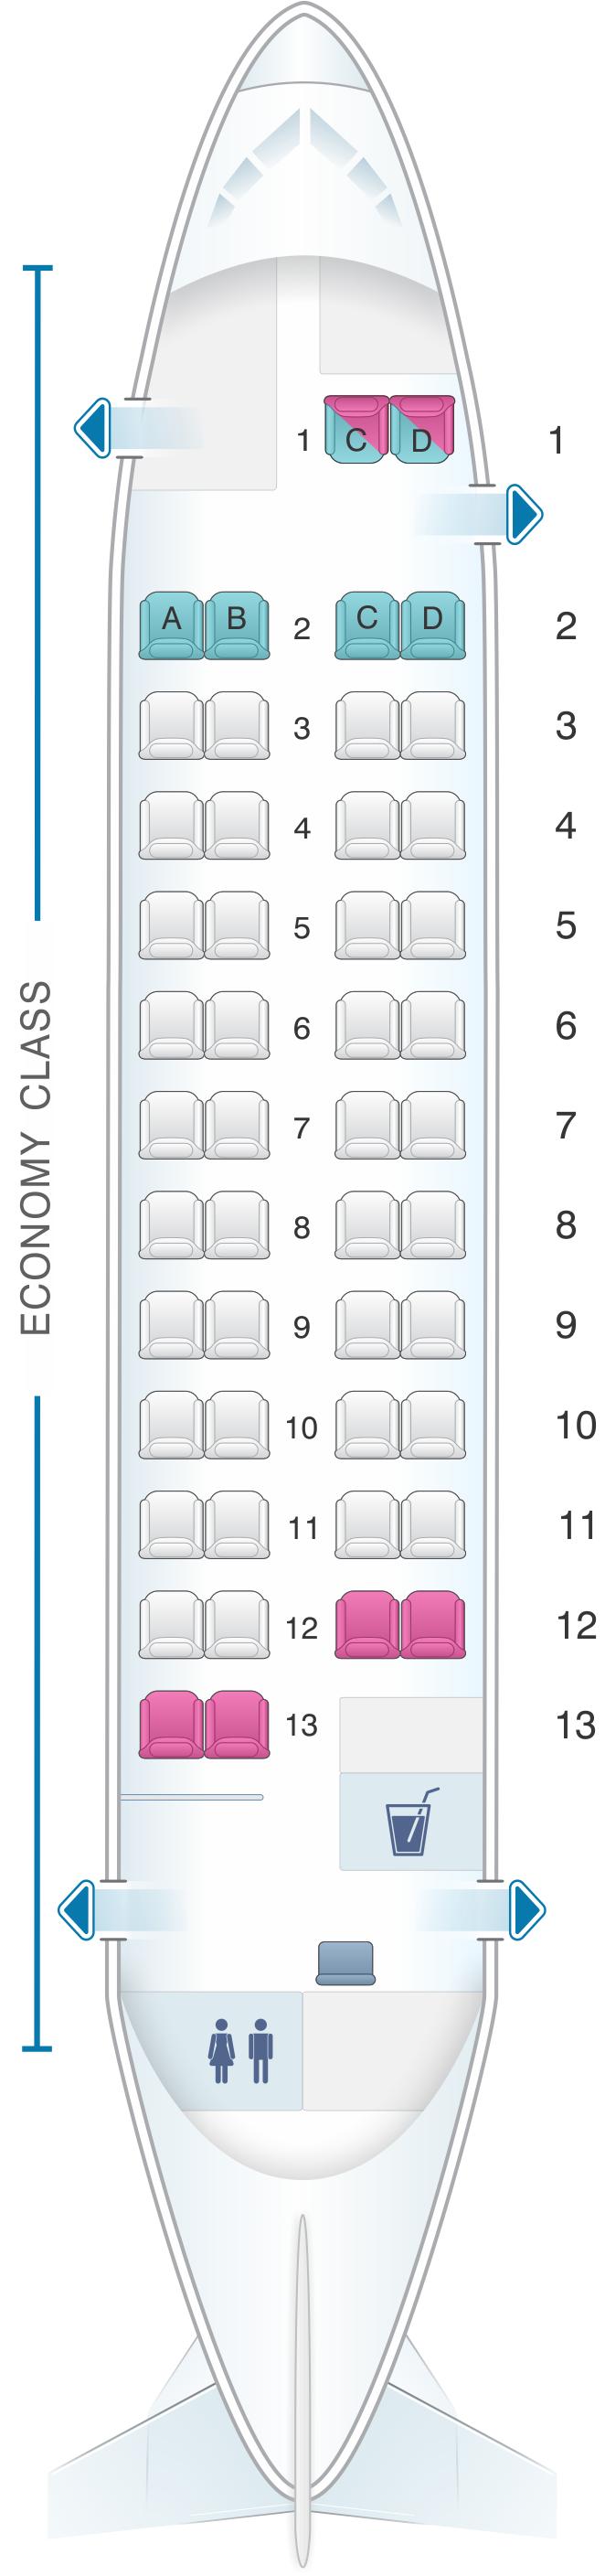 Seat map for TAROM ATR 42 500 48pax